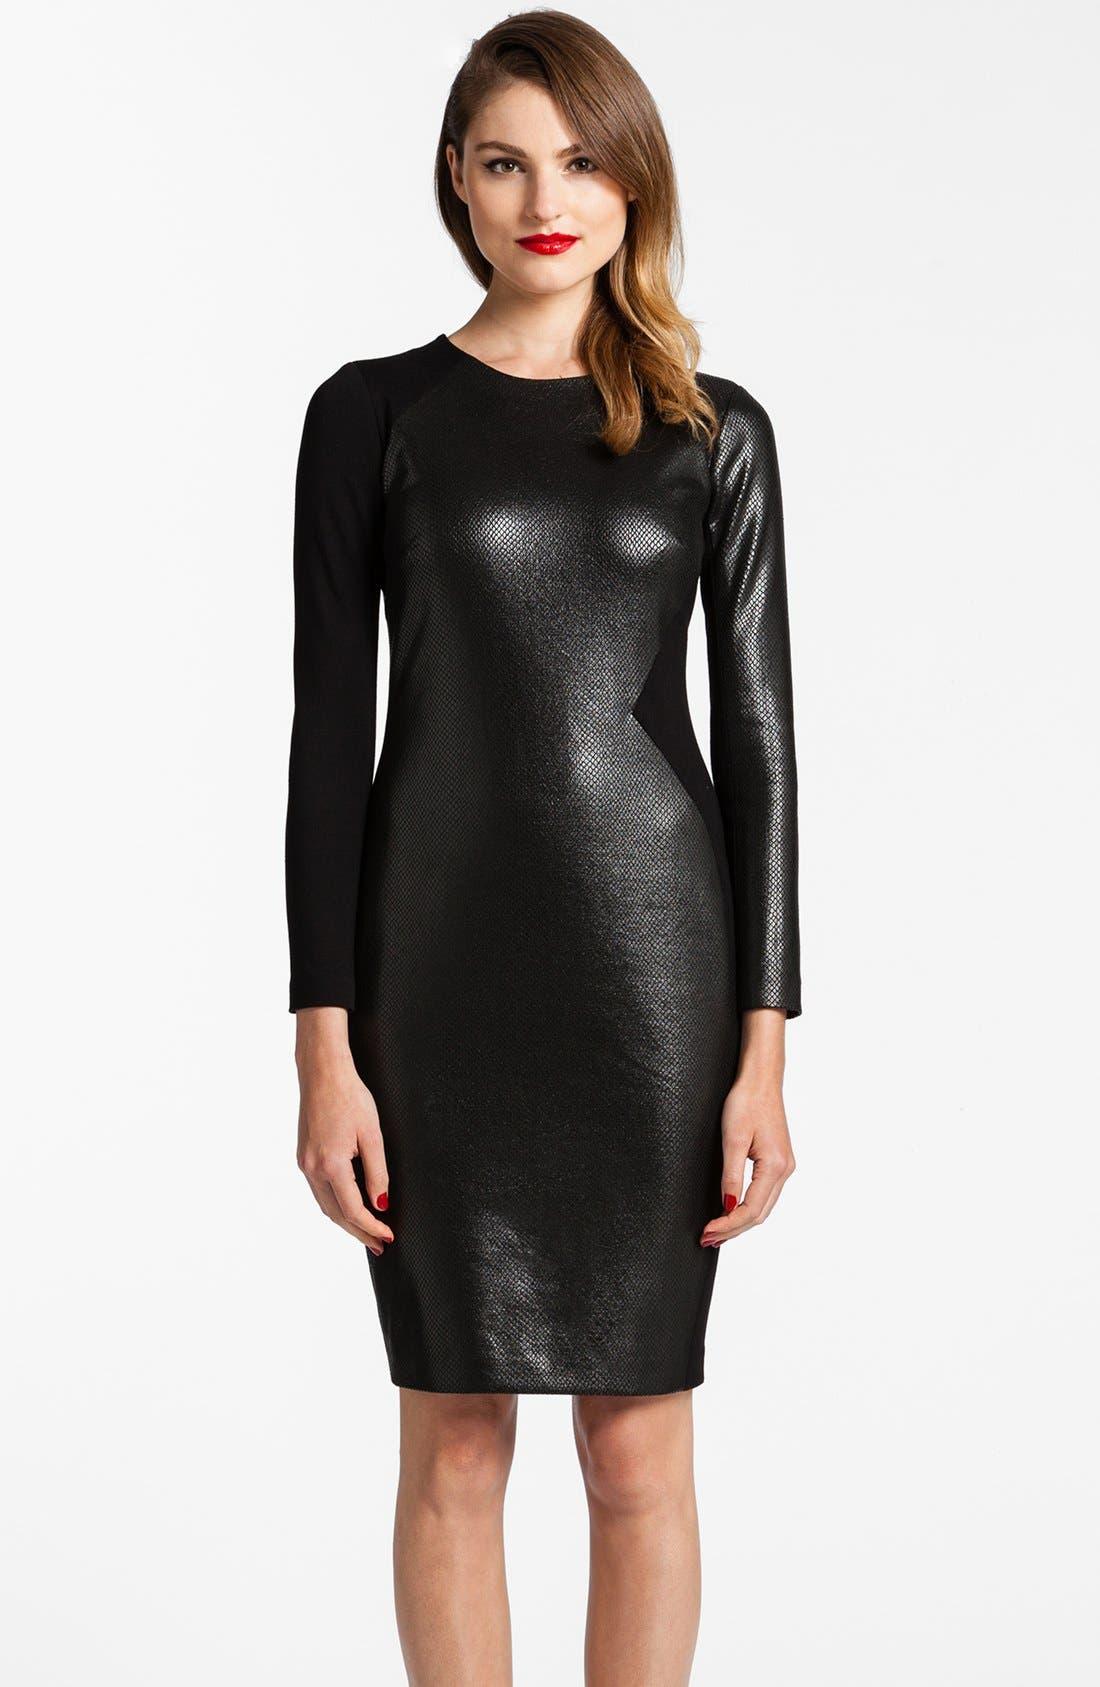 Alternate Image 1 Selected - Cynthia Steffe 'Leni' Faux Leather Body-Con Dress